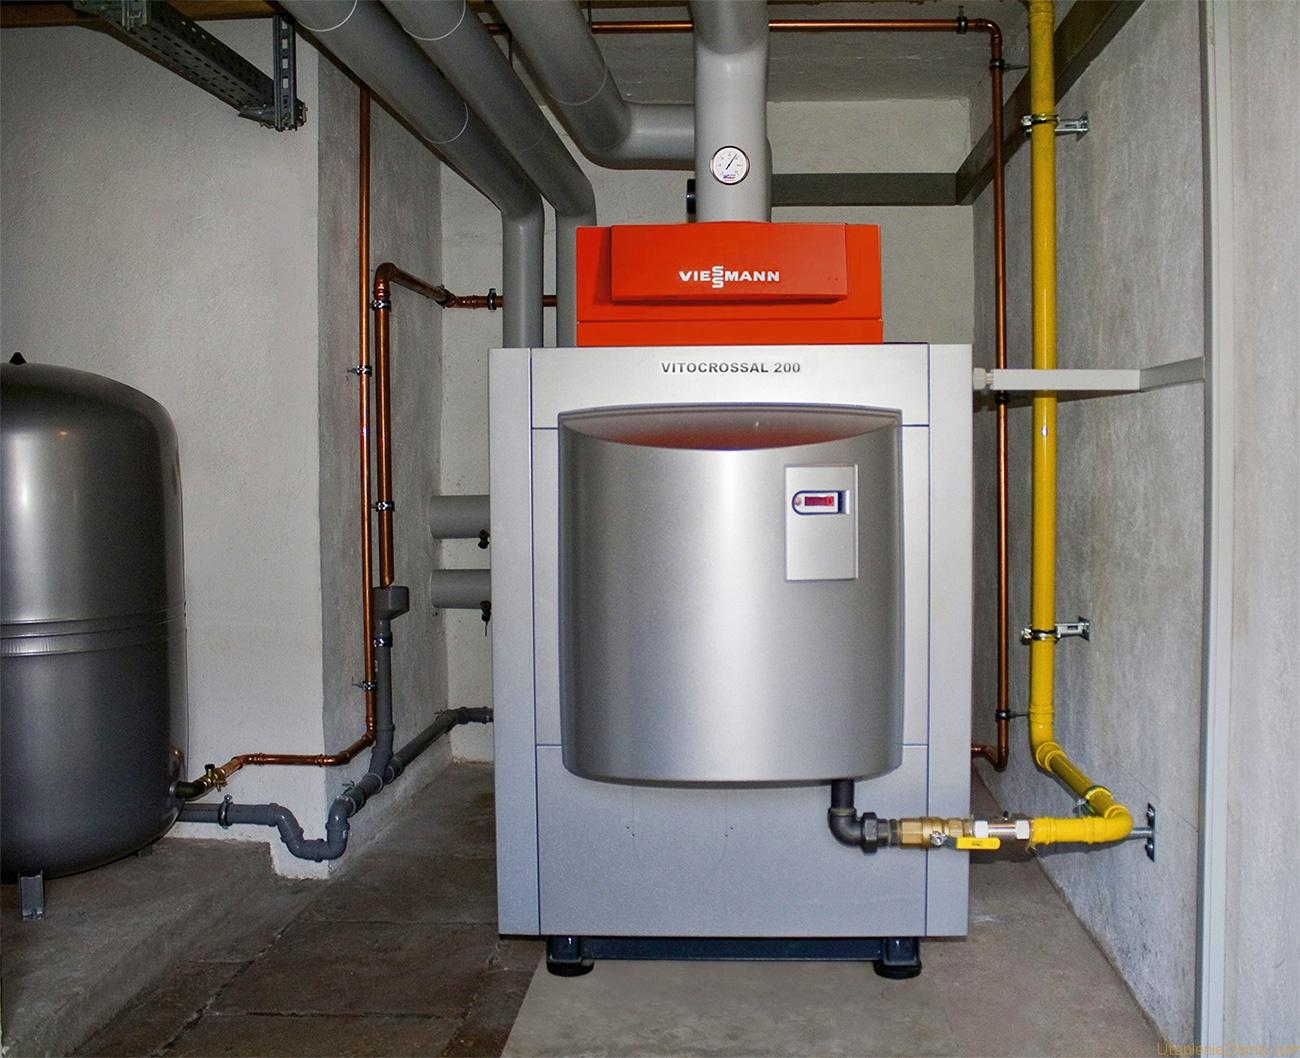 radiateur vertical chauffage central gaz devis estimatif reims colmar dijon soci t gtumr. Black Bedroom Furniture Sets. Home Design Ideas